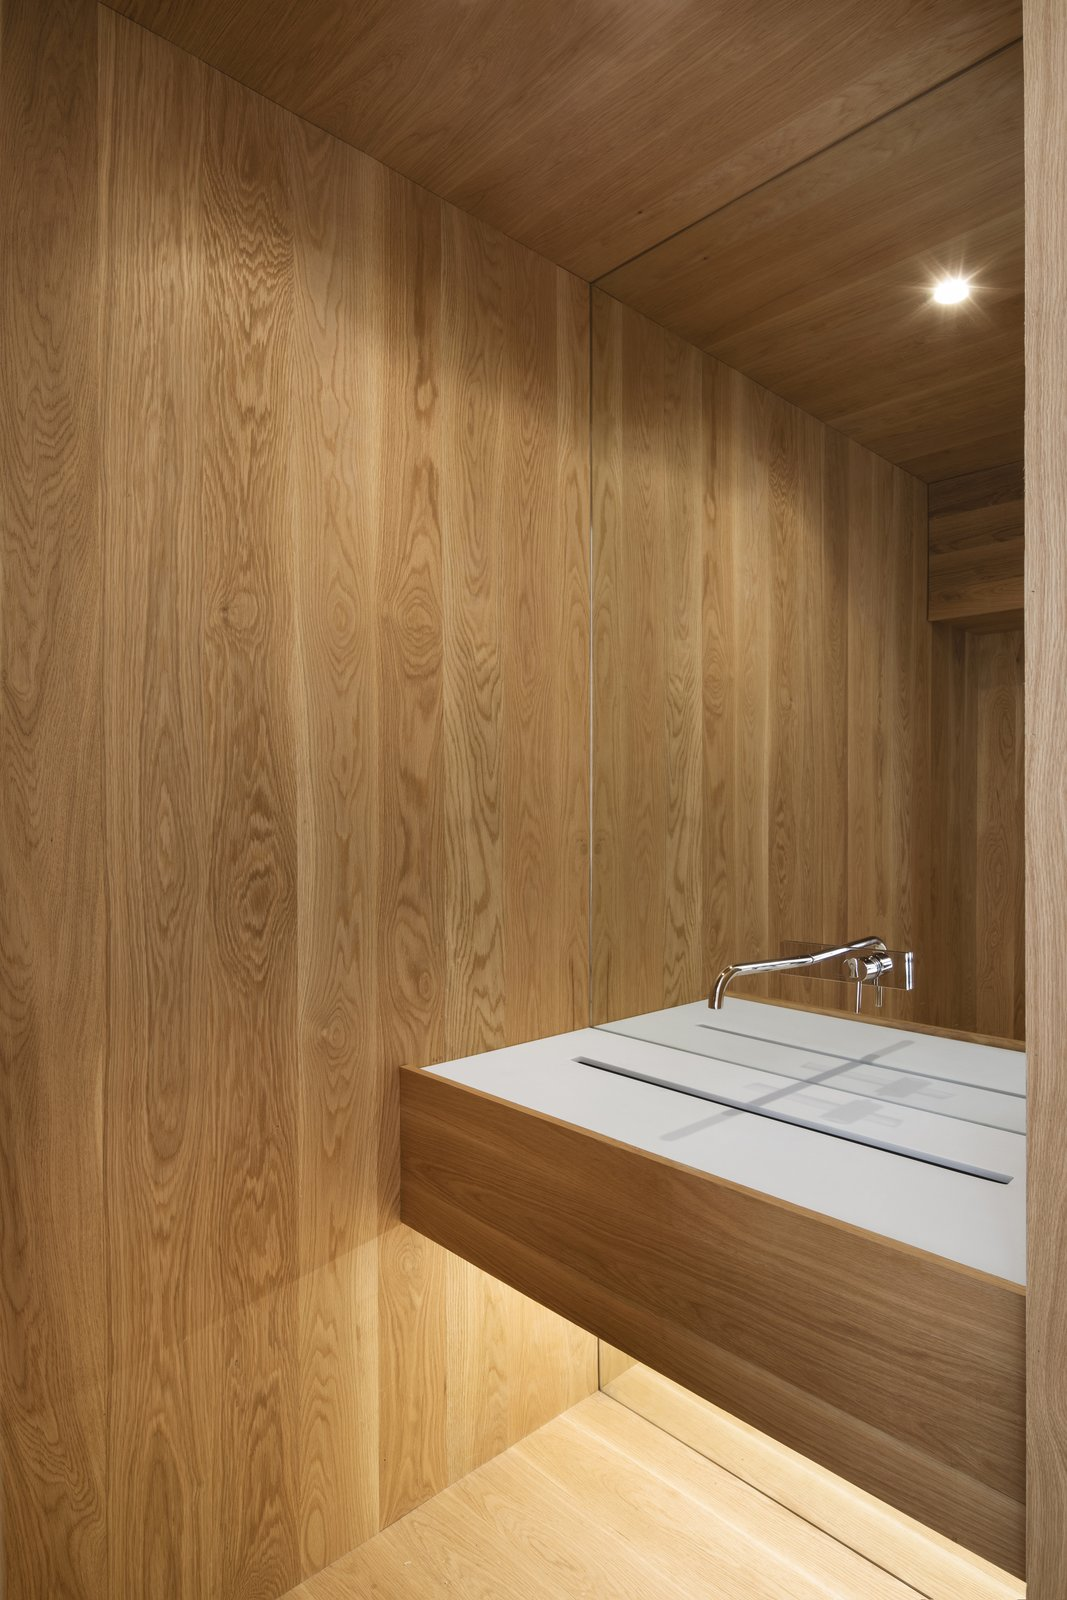 Bath Room, Medium Hardwood Floor, One Piece Toilet, Ceiling Lighting, and Undermount Sink  Photos from The House on Drolet Street